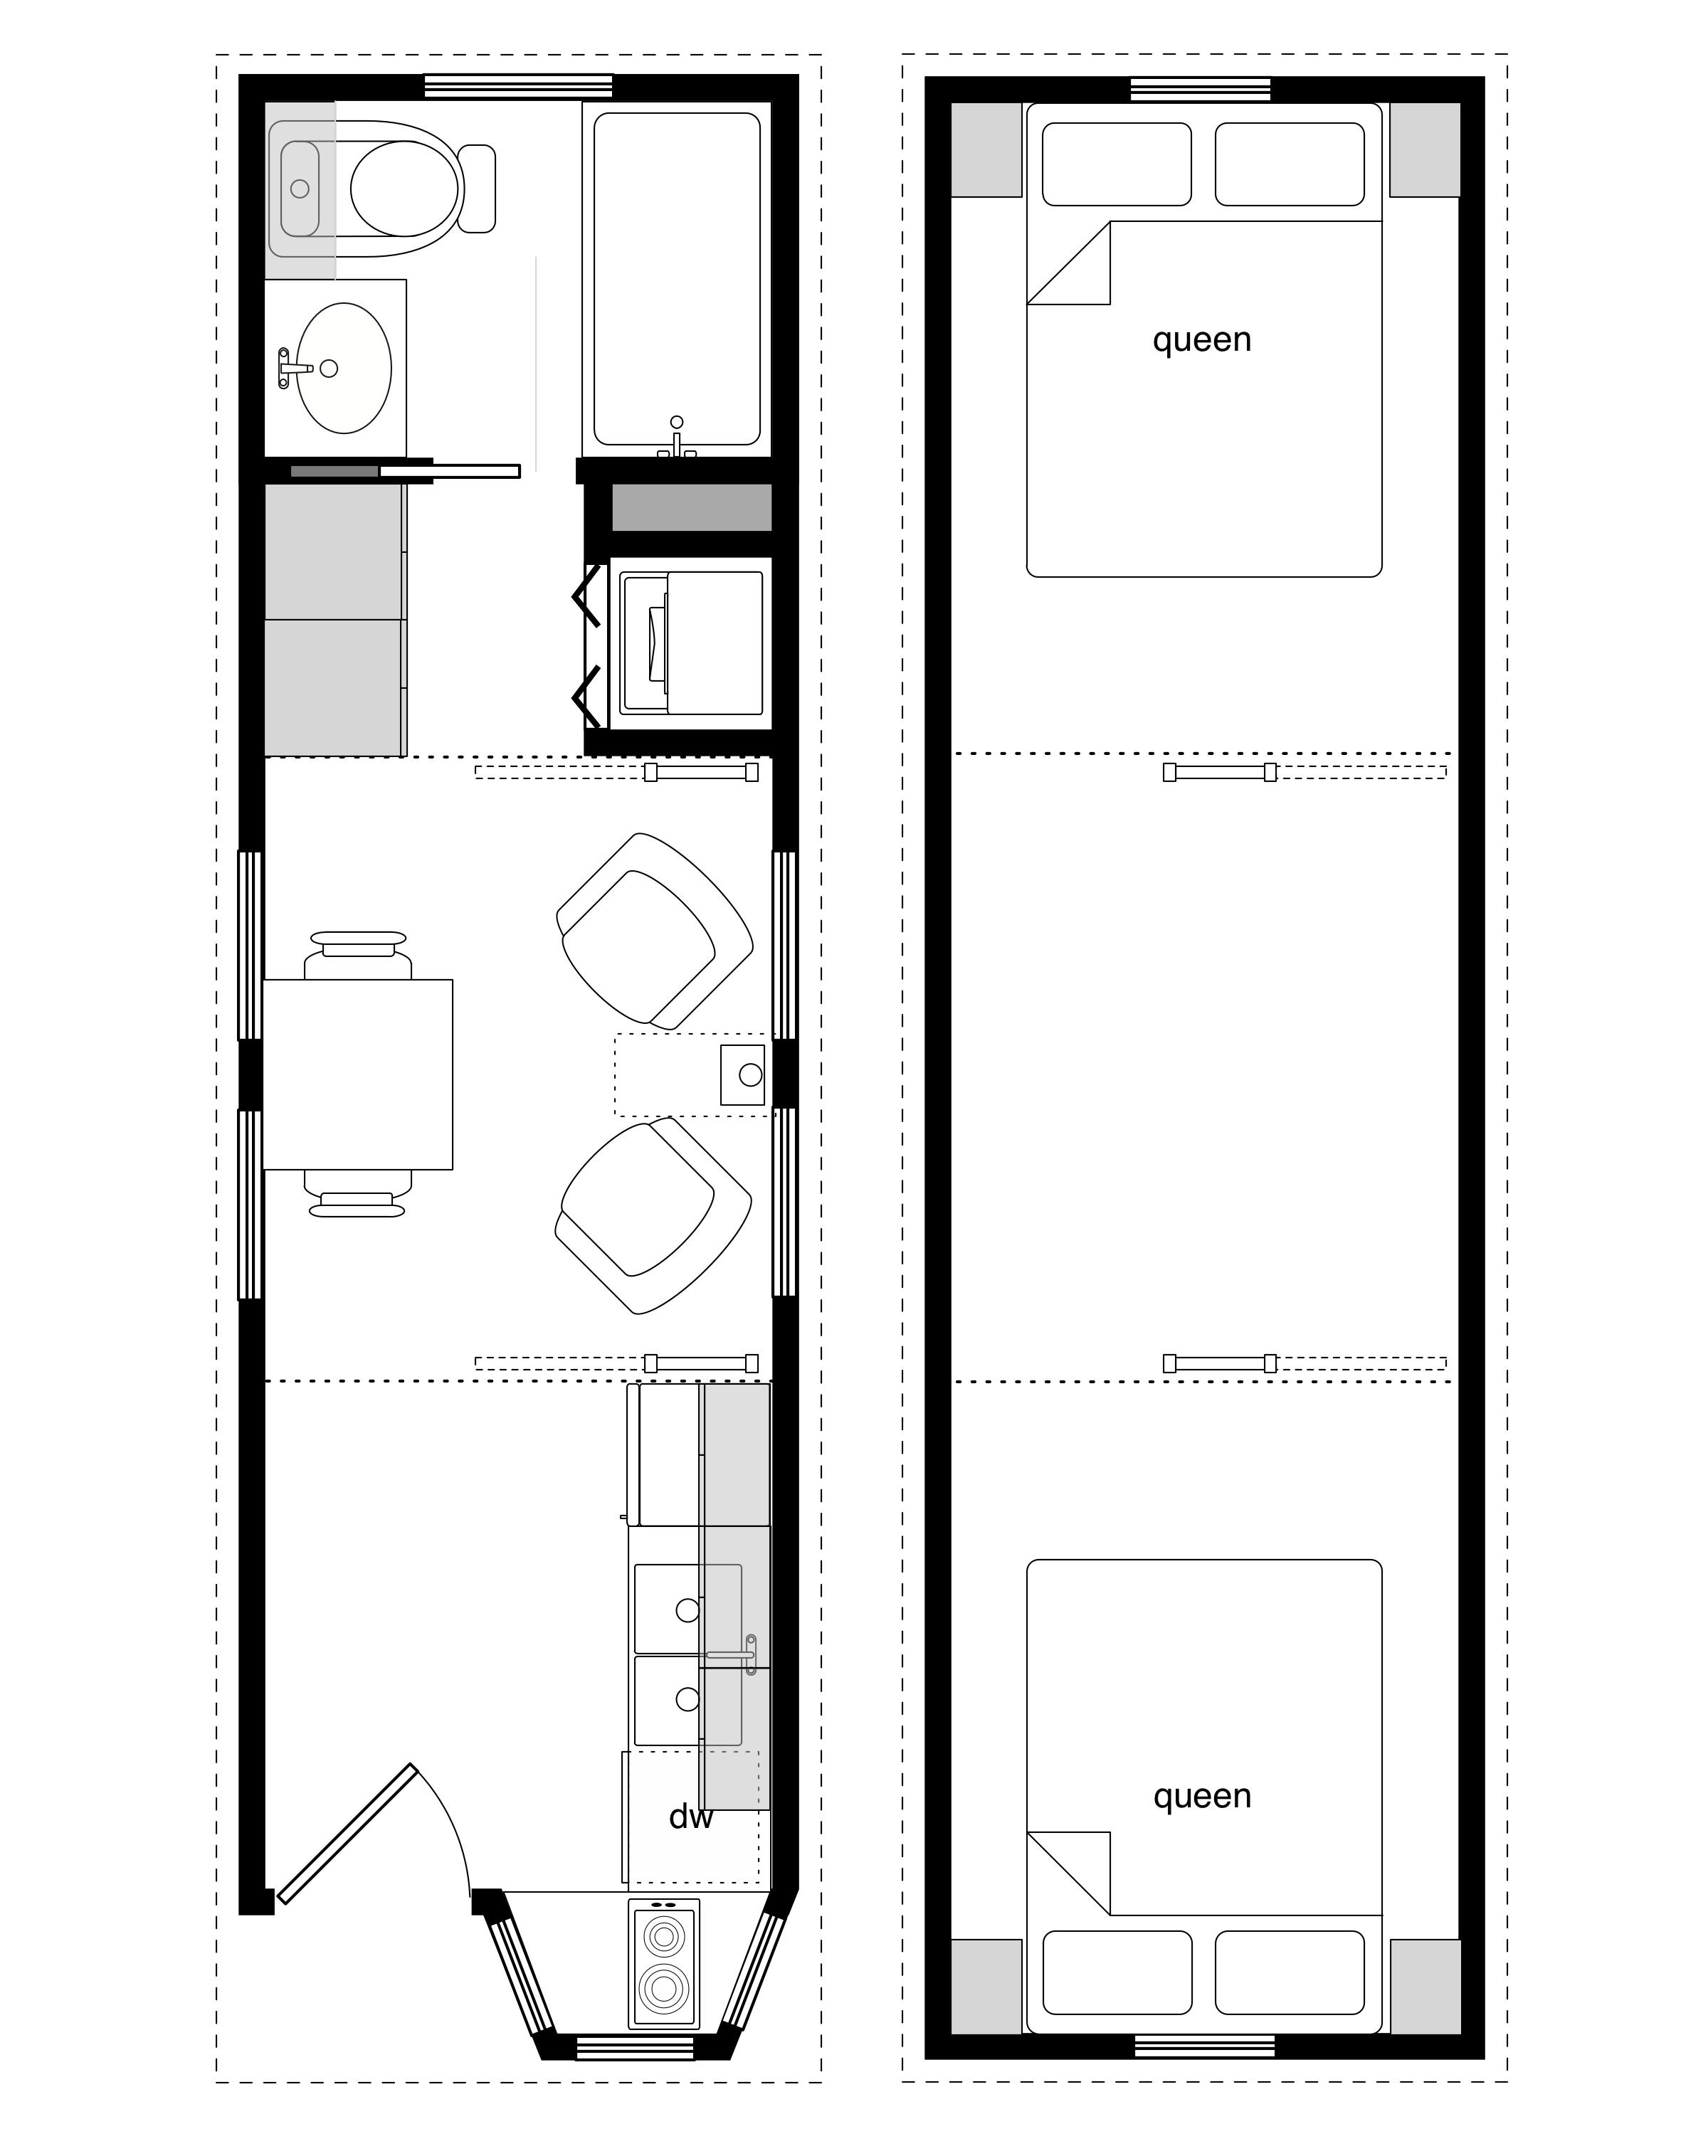 Terrific 63 Best Ideas About Tiny Home Floor Plans On Pinterest Largest Home Design Picture Inspirations Pitcheantrous